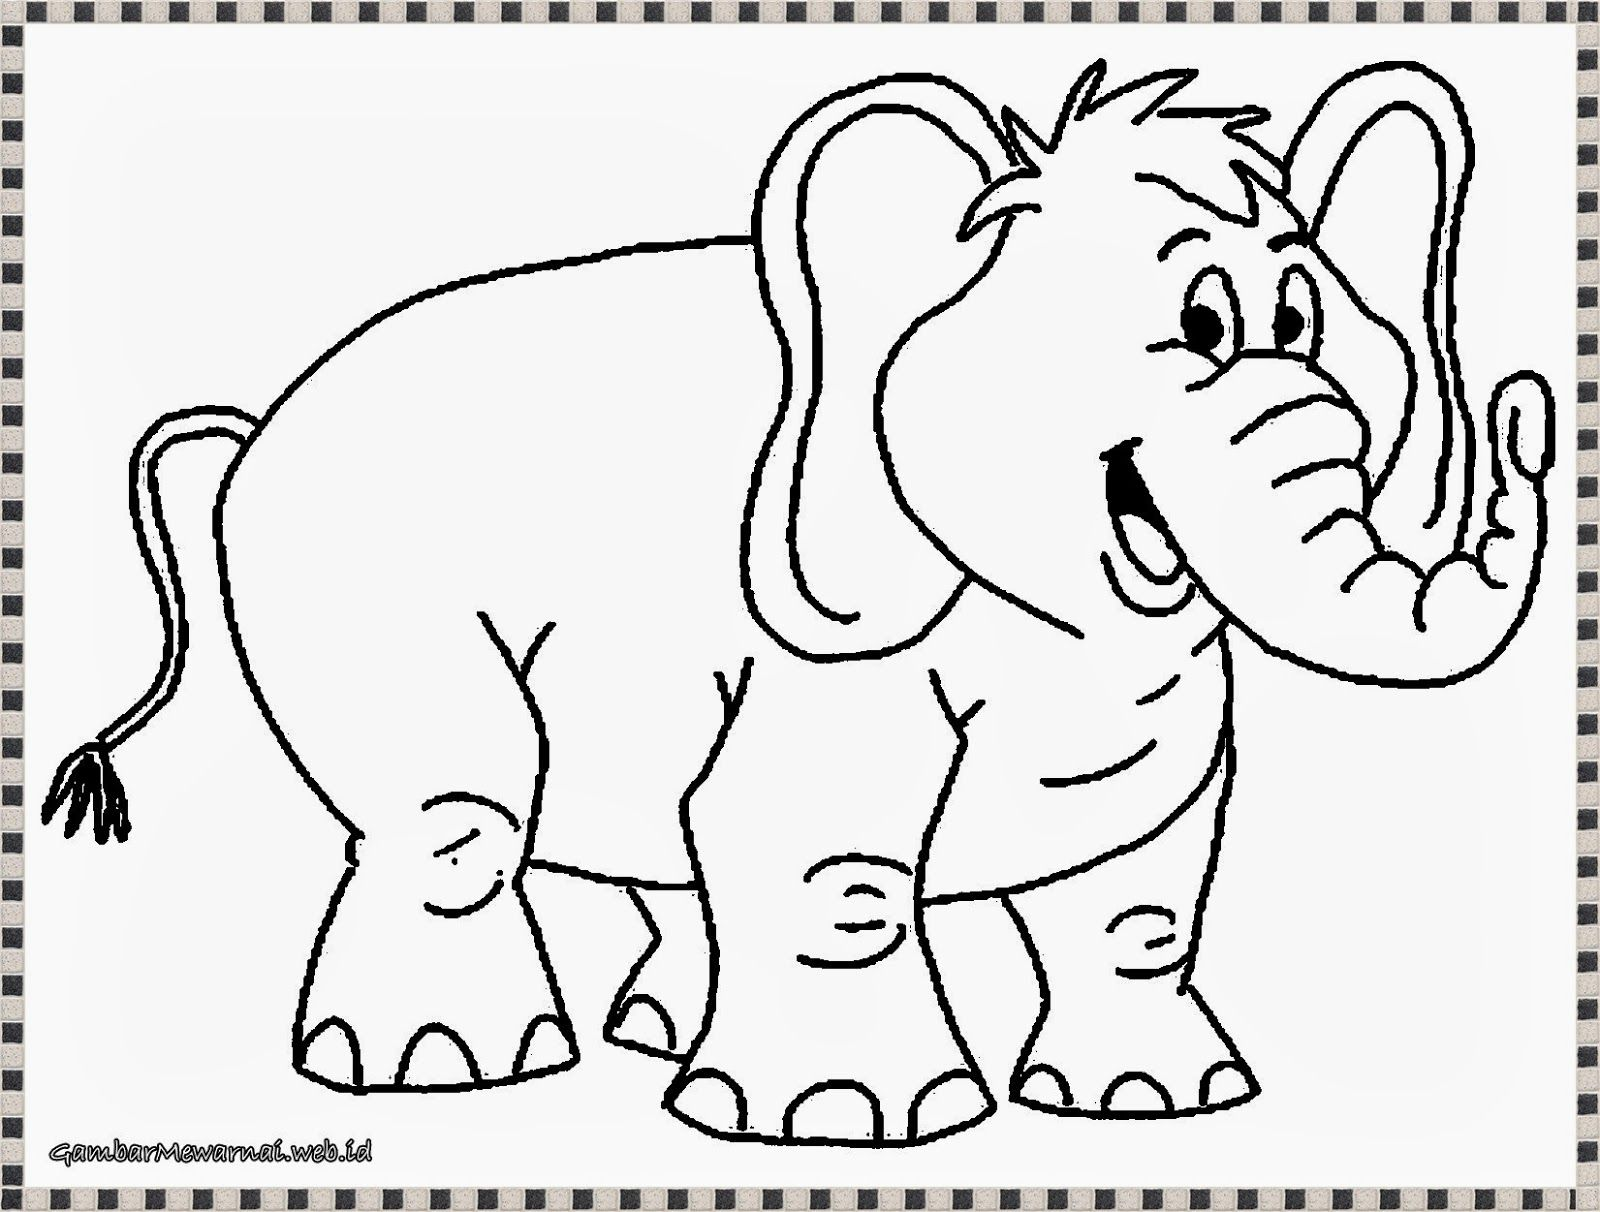 Gambar Mewarnai Gajah Halaman Mewarnai Gambar Hewan Gajah Afrika